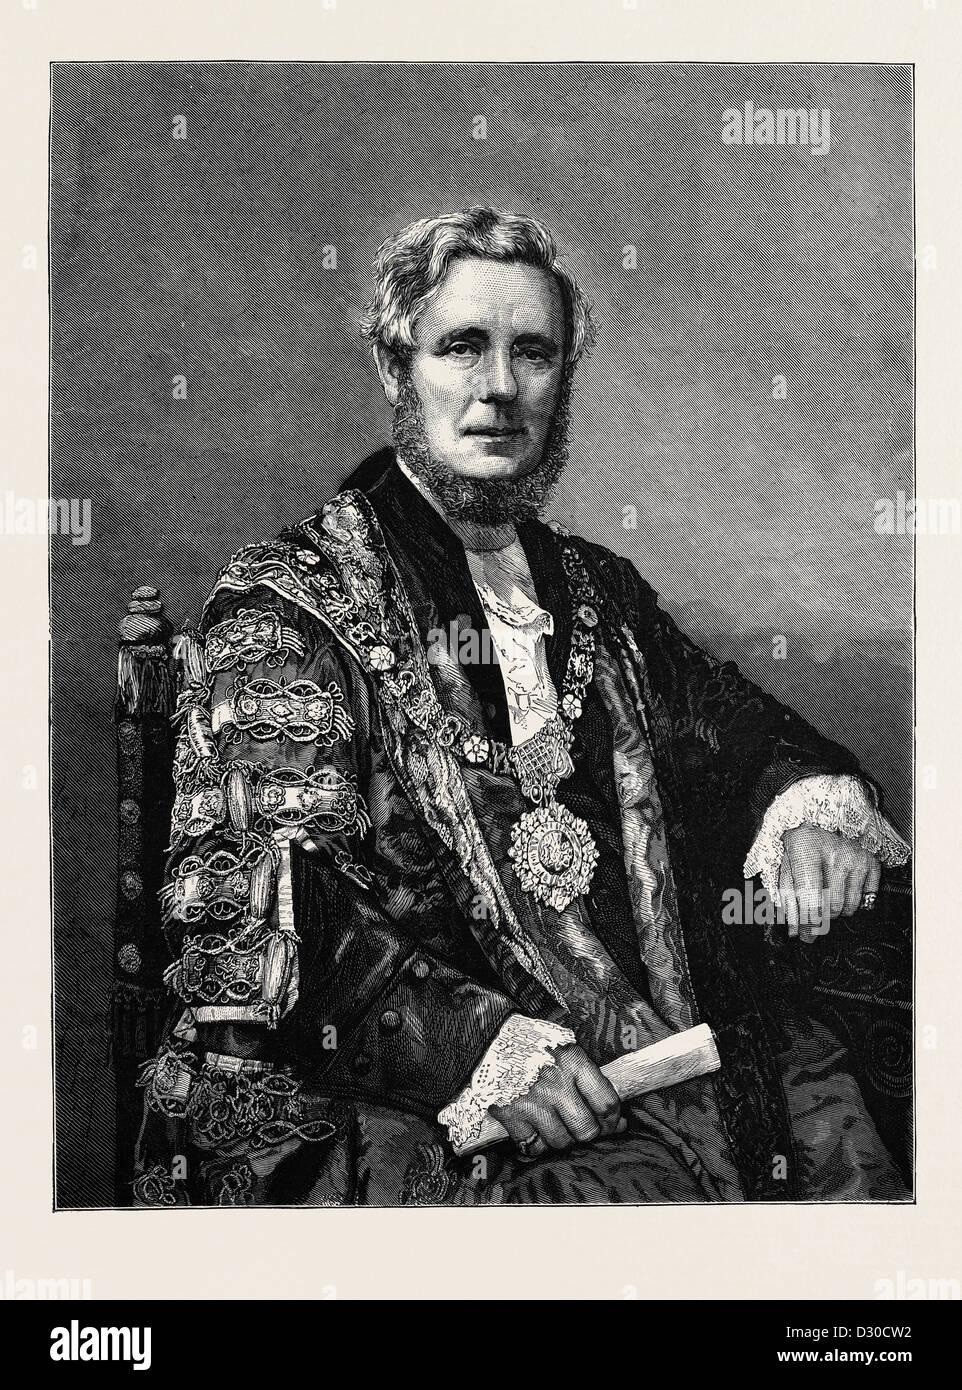 Le très honorable sir SYDNEY HEDLEY WATERLOW, KNT., Lord Maire de Londres Photo Stock